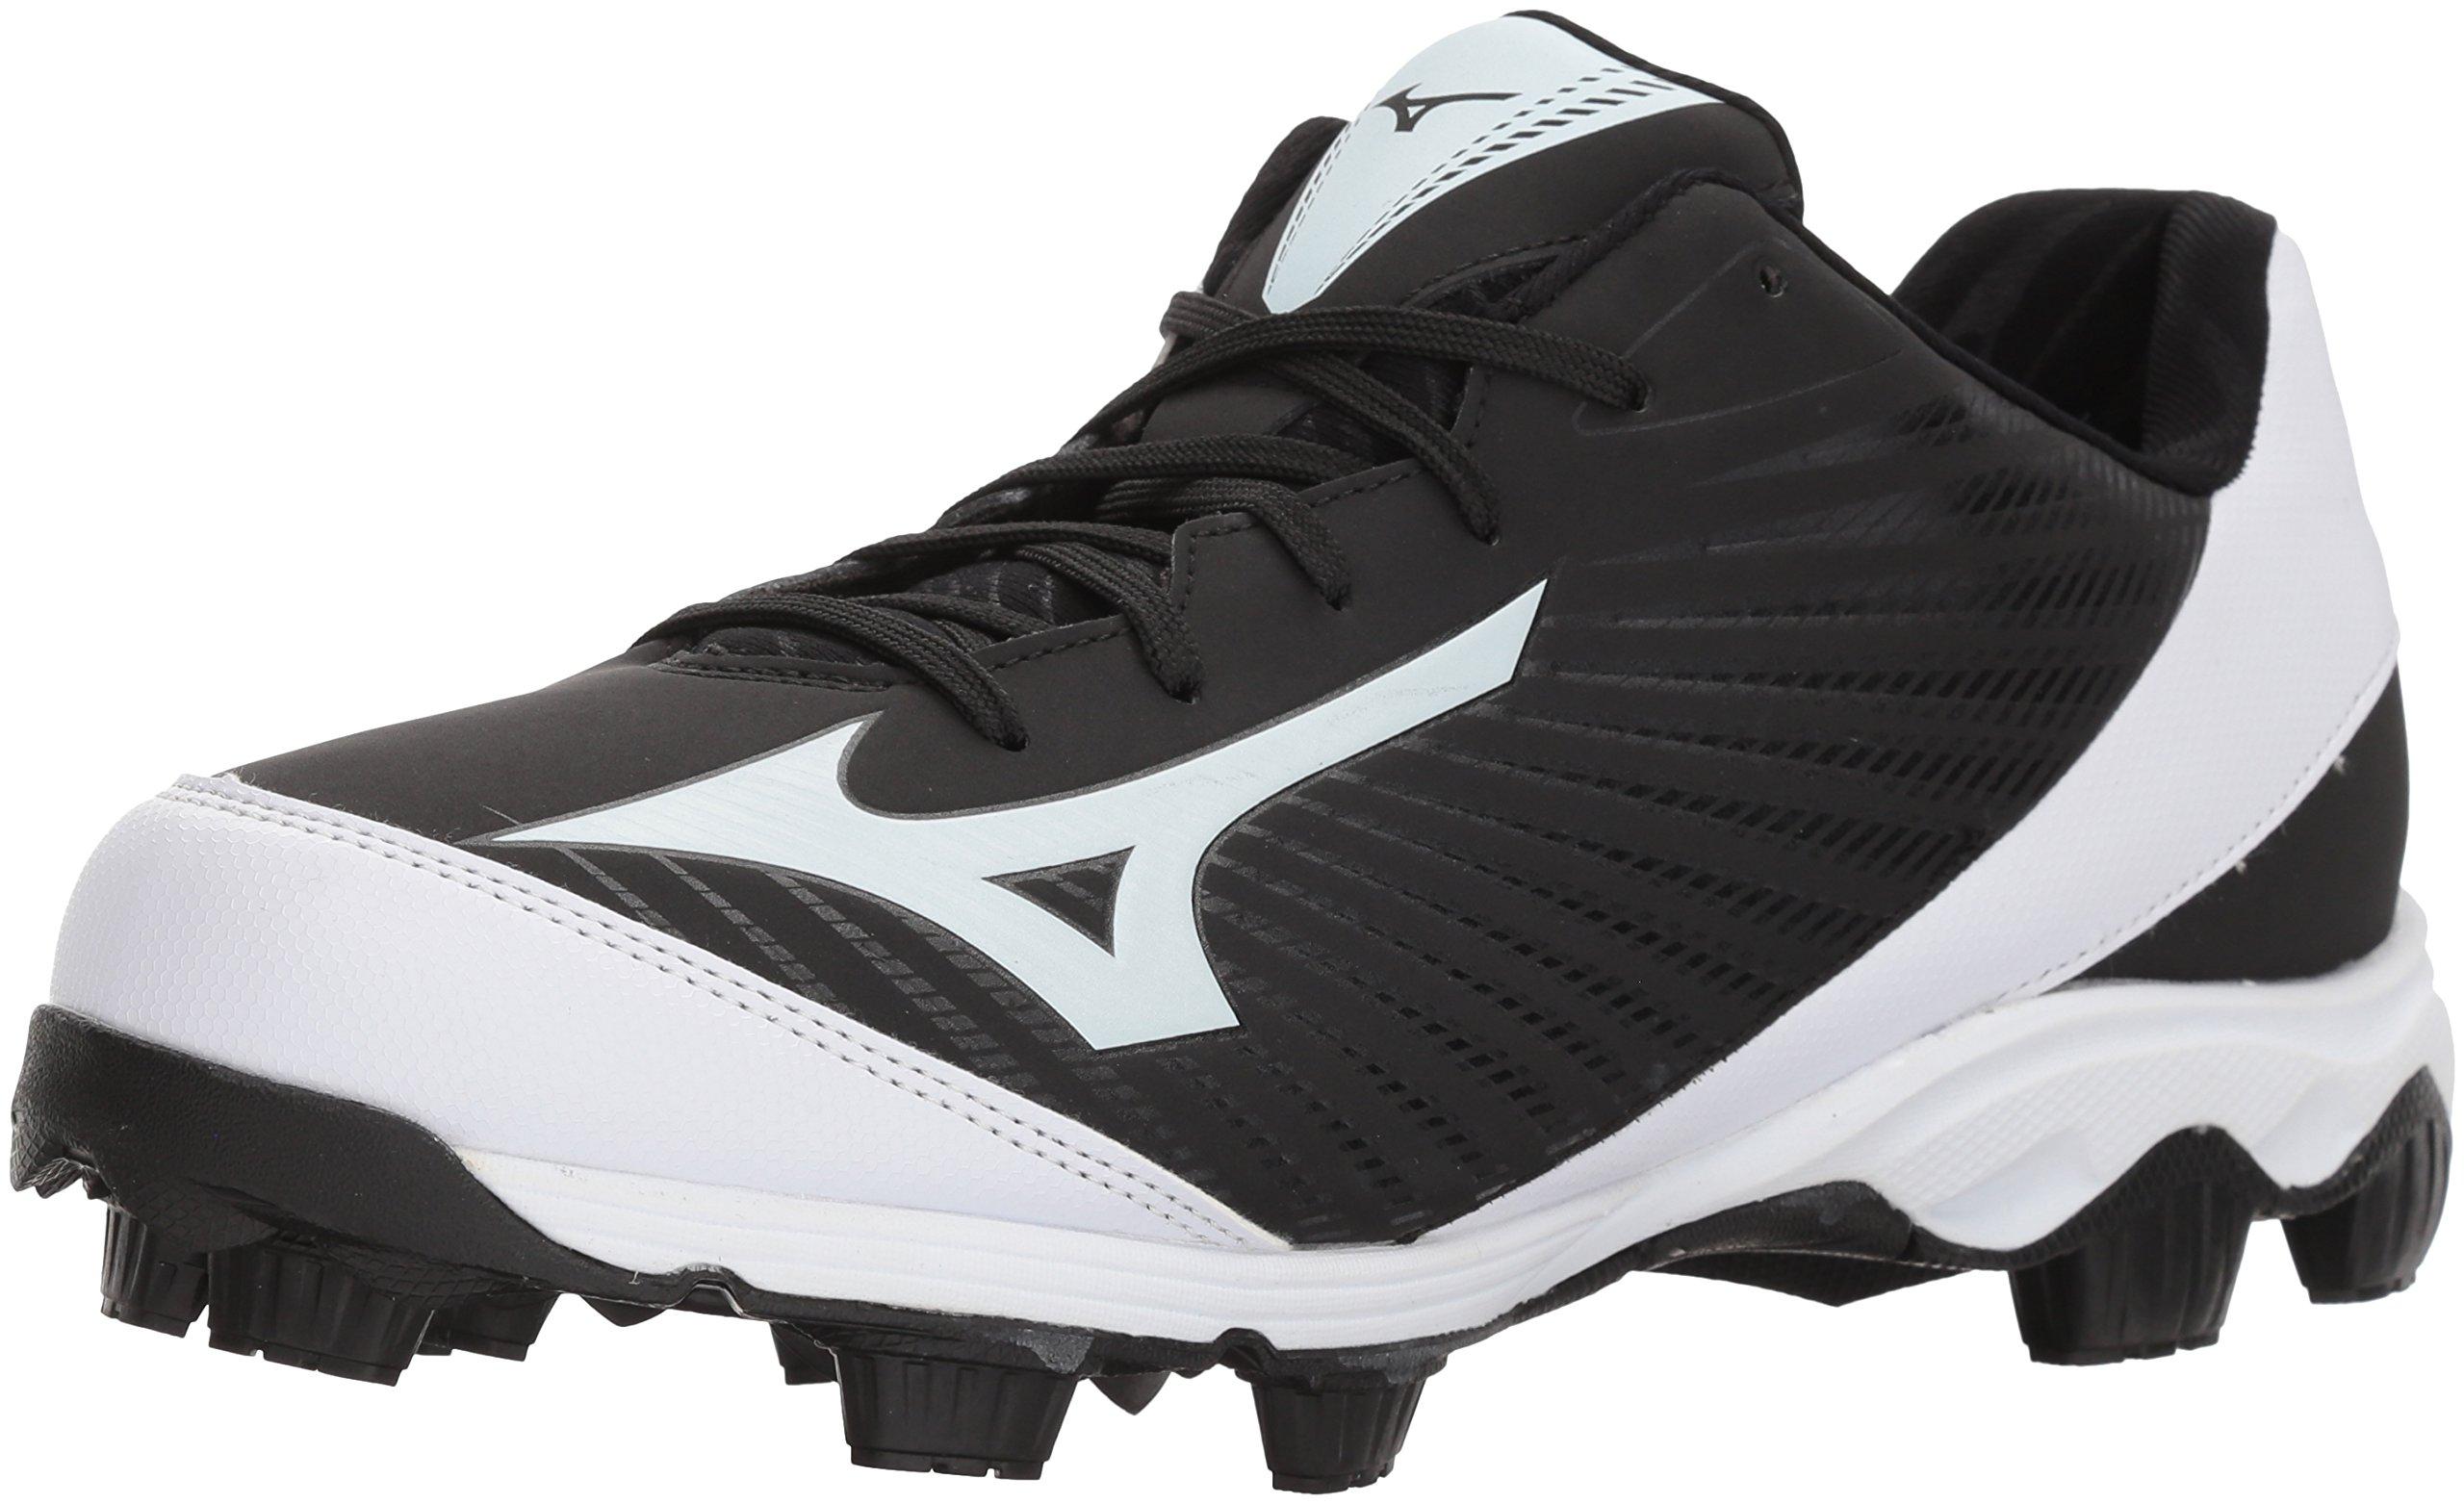 Mizuno (MIZD9) Men's 9-Spike Advanced Franchise 9 Molded Cleat-Low Baseball Shoe, Black/White, 10.5 D US by Mizuno (MIZD9)